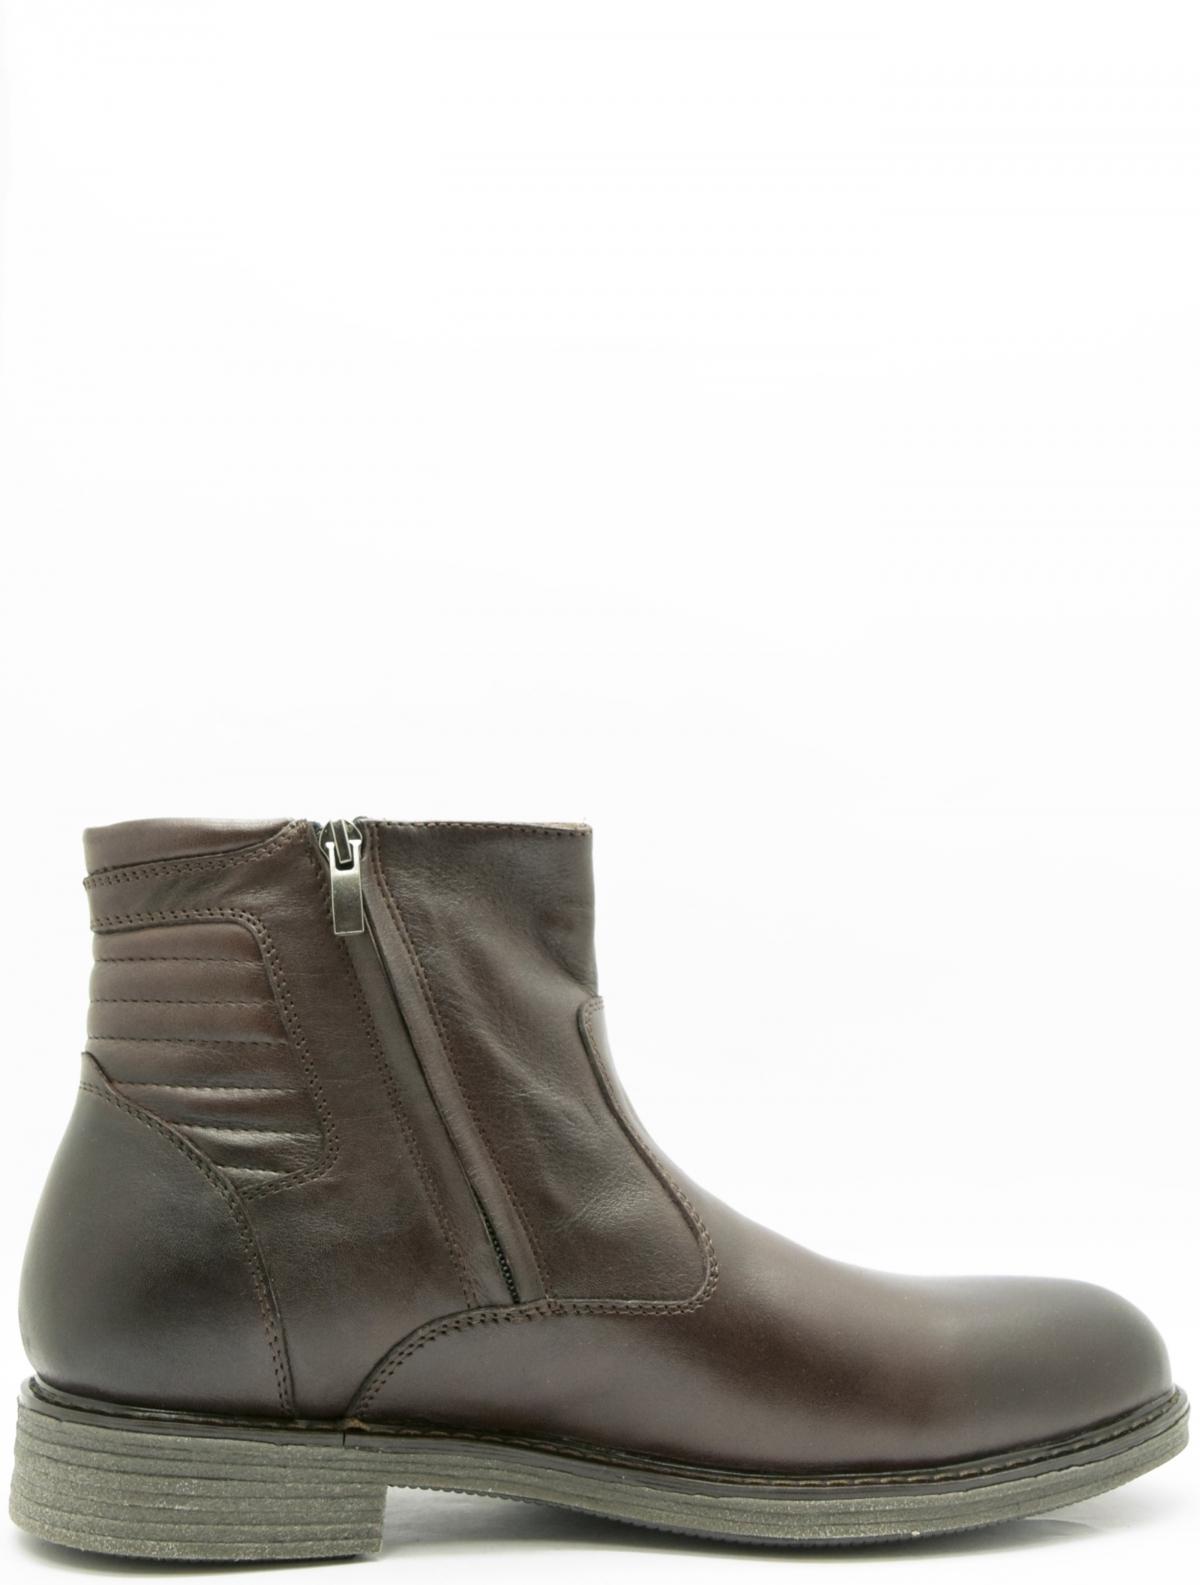 Baratto 1-858-301-2-2 мужские ботинки